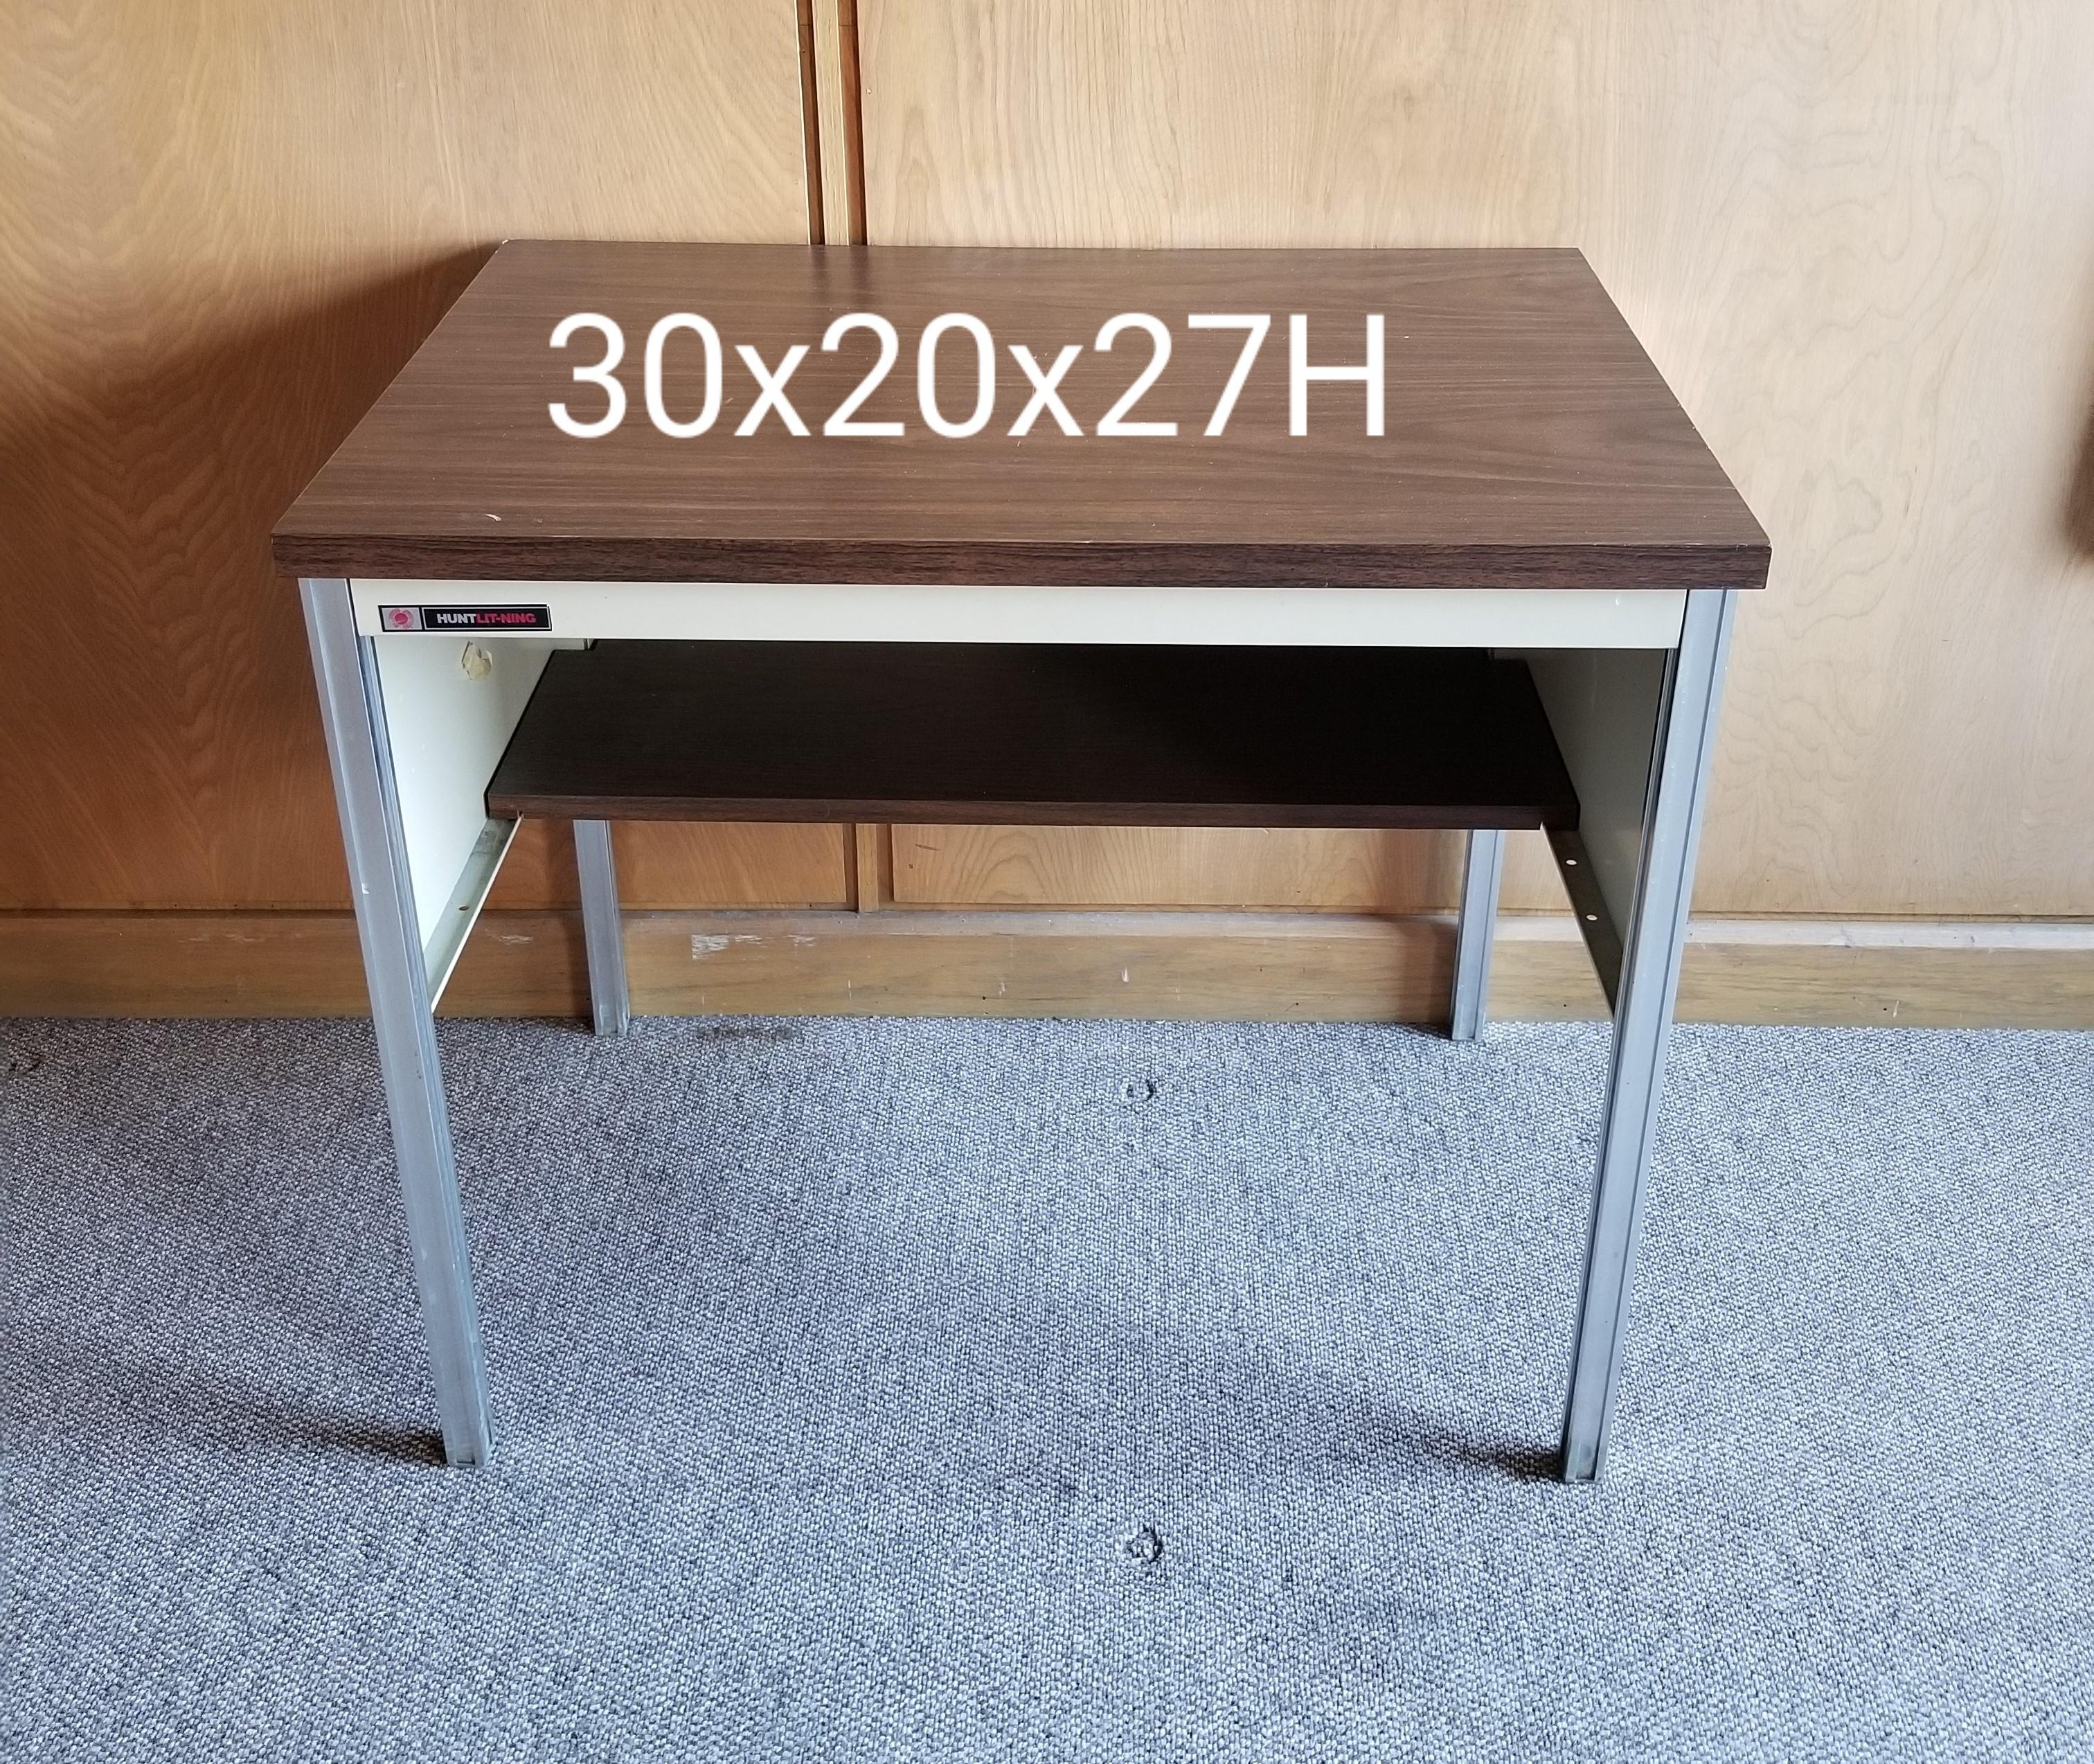 #250. Table 30x20x27